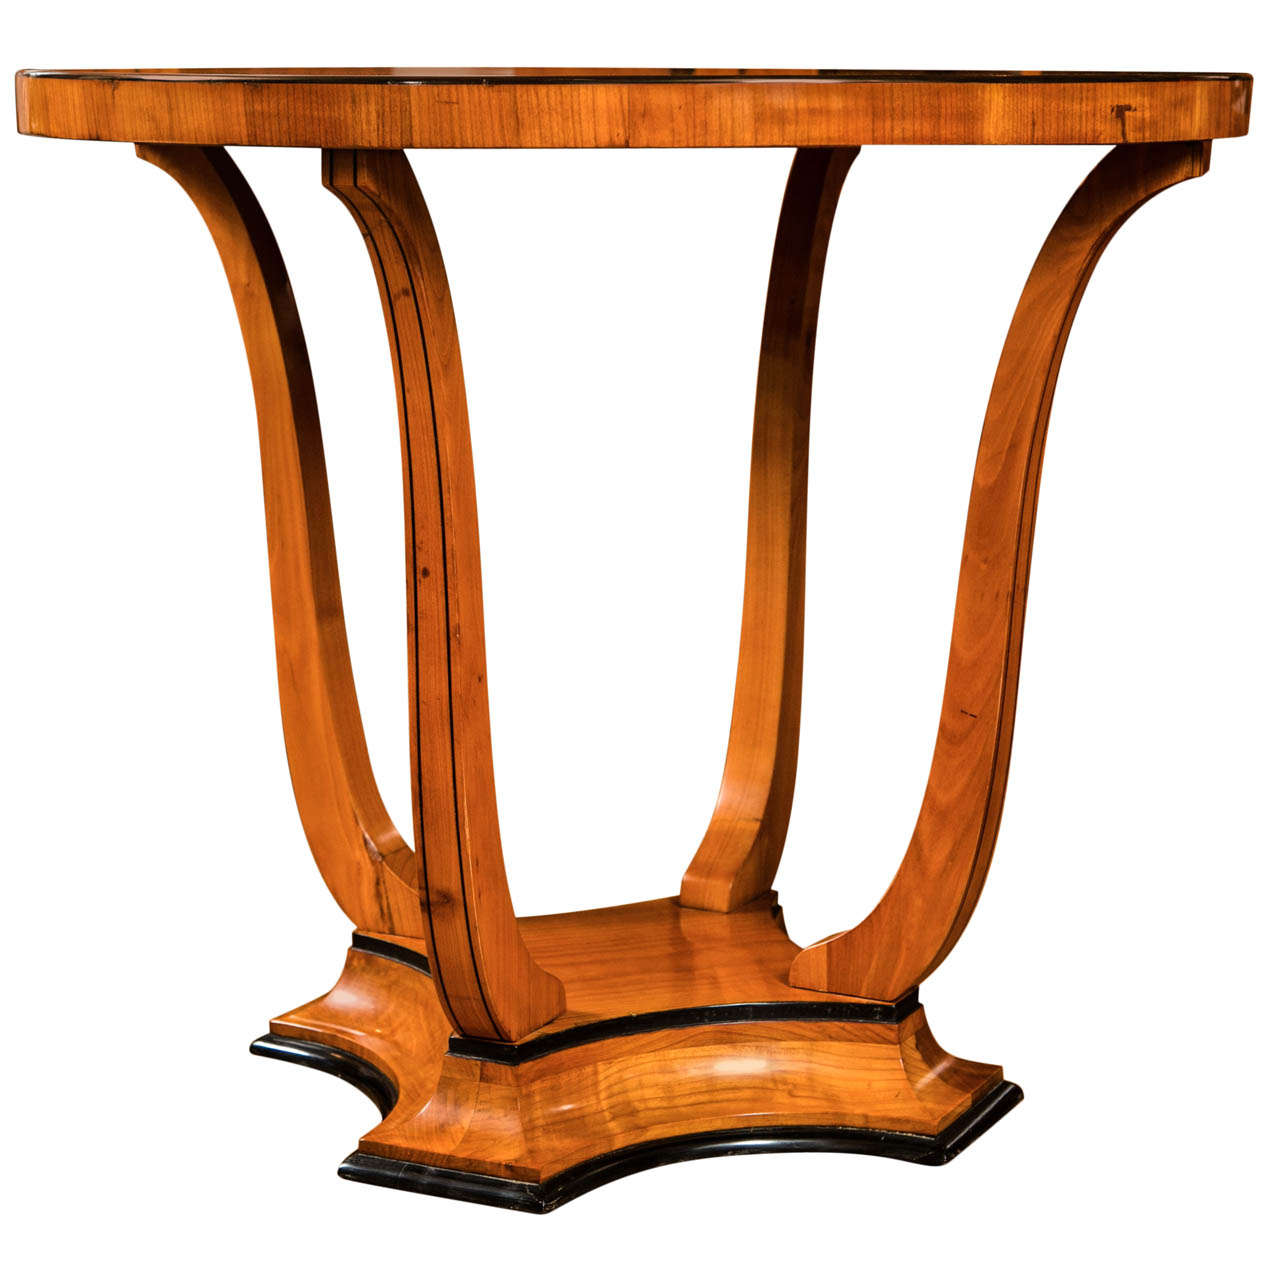 Graceful Art Deco Table For Sale